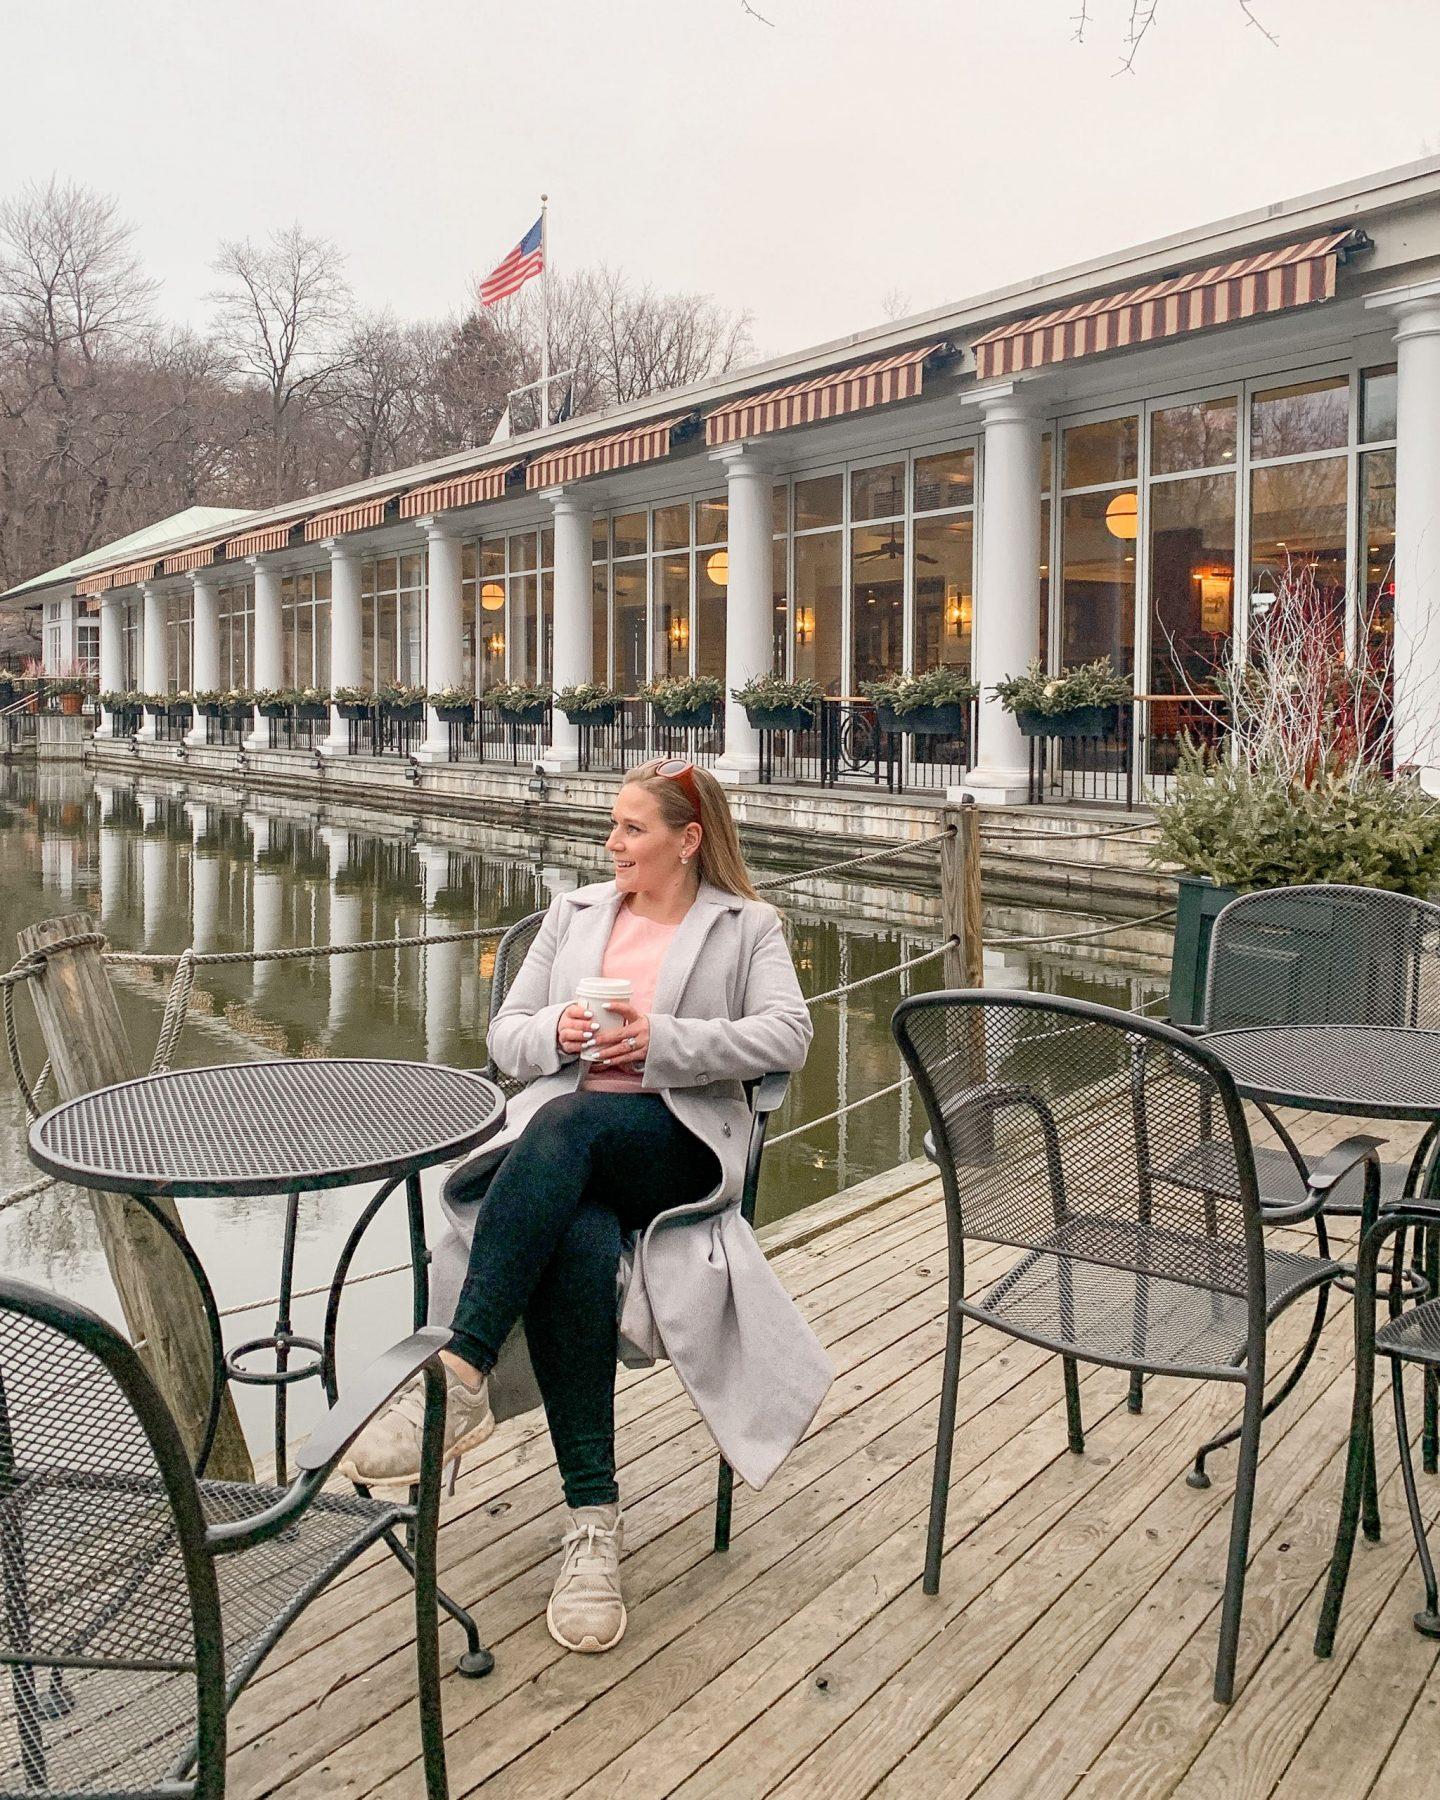 Central Park Boathouse, New York City, Katie Heath, KALANCHOE